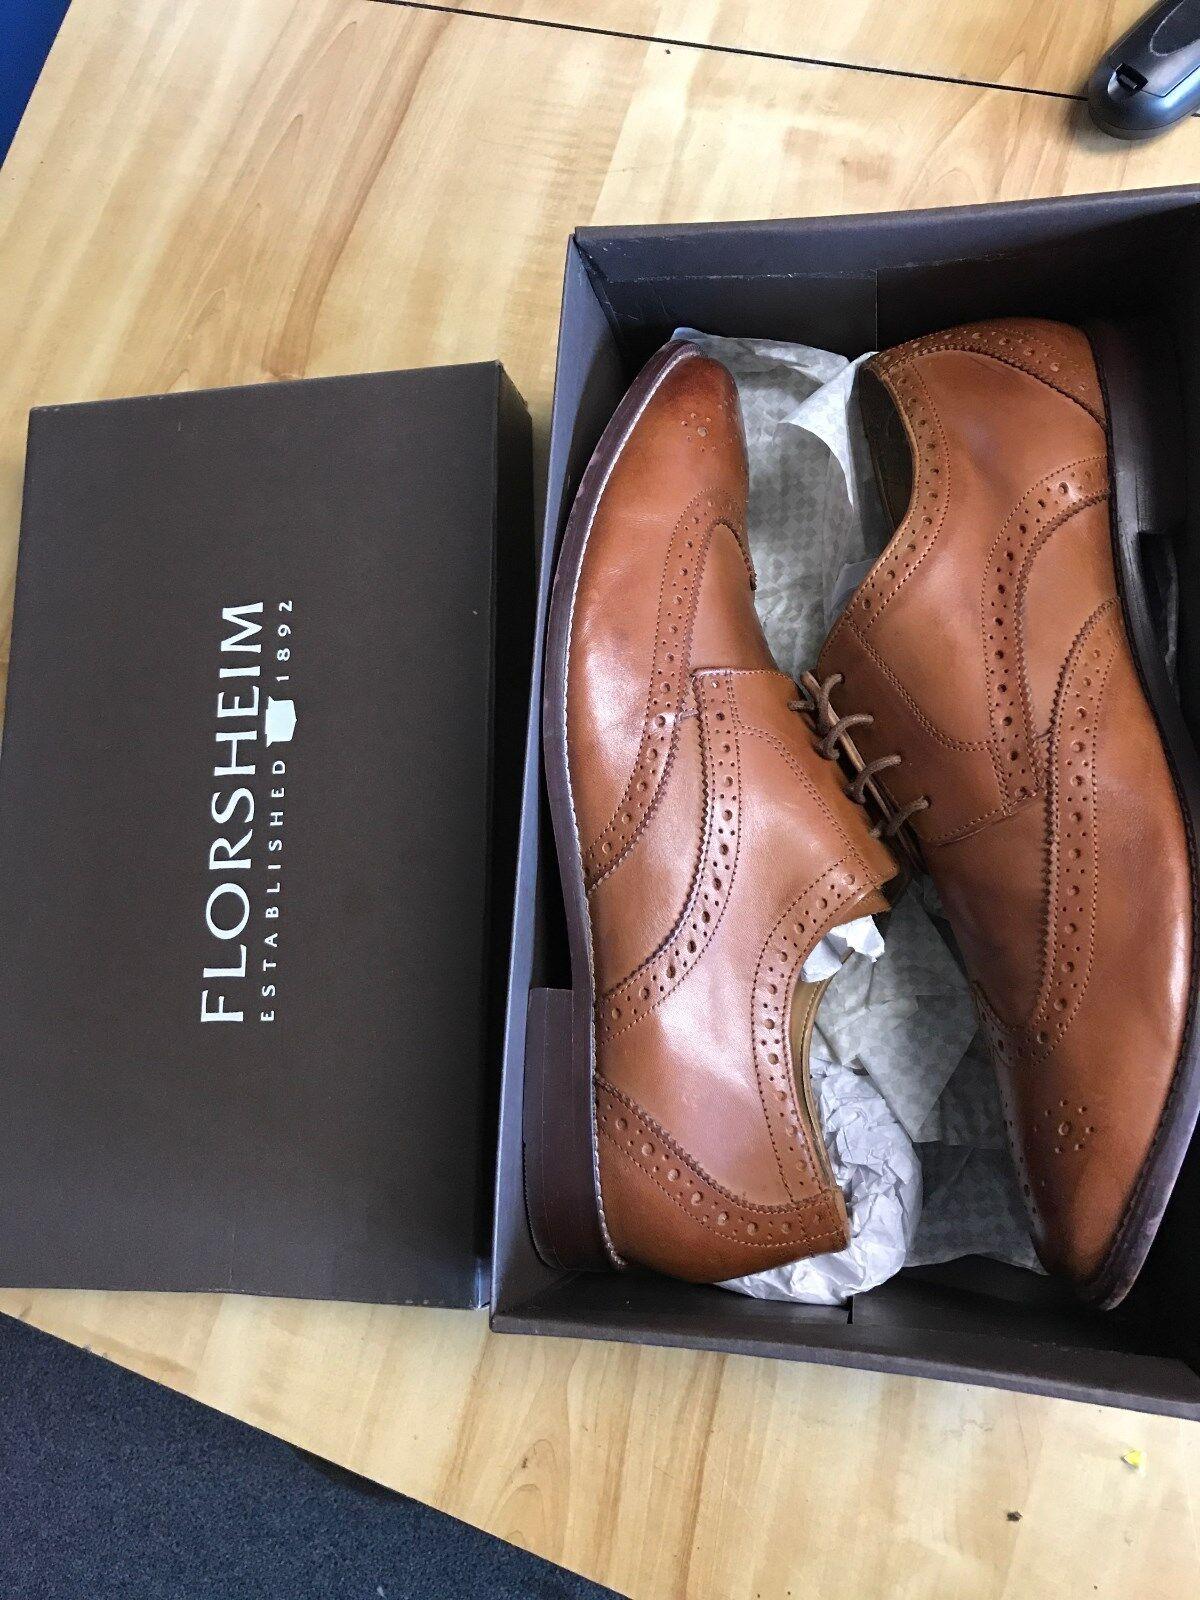 Florsheim Montinaro saddle tan 13 D wing tip leather dress shoes